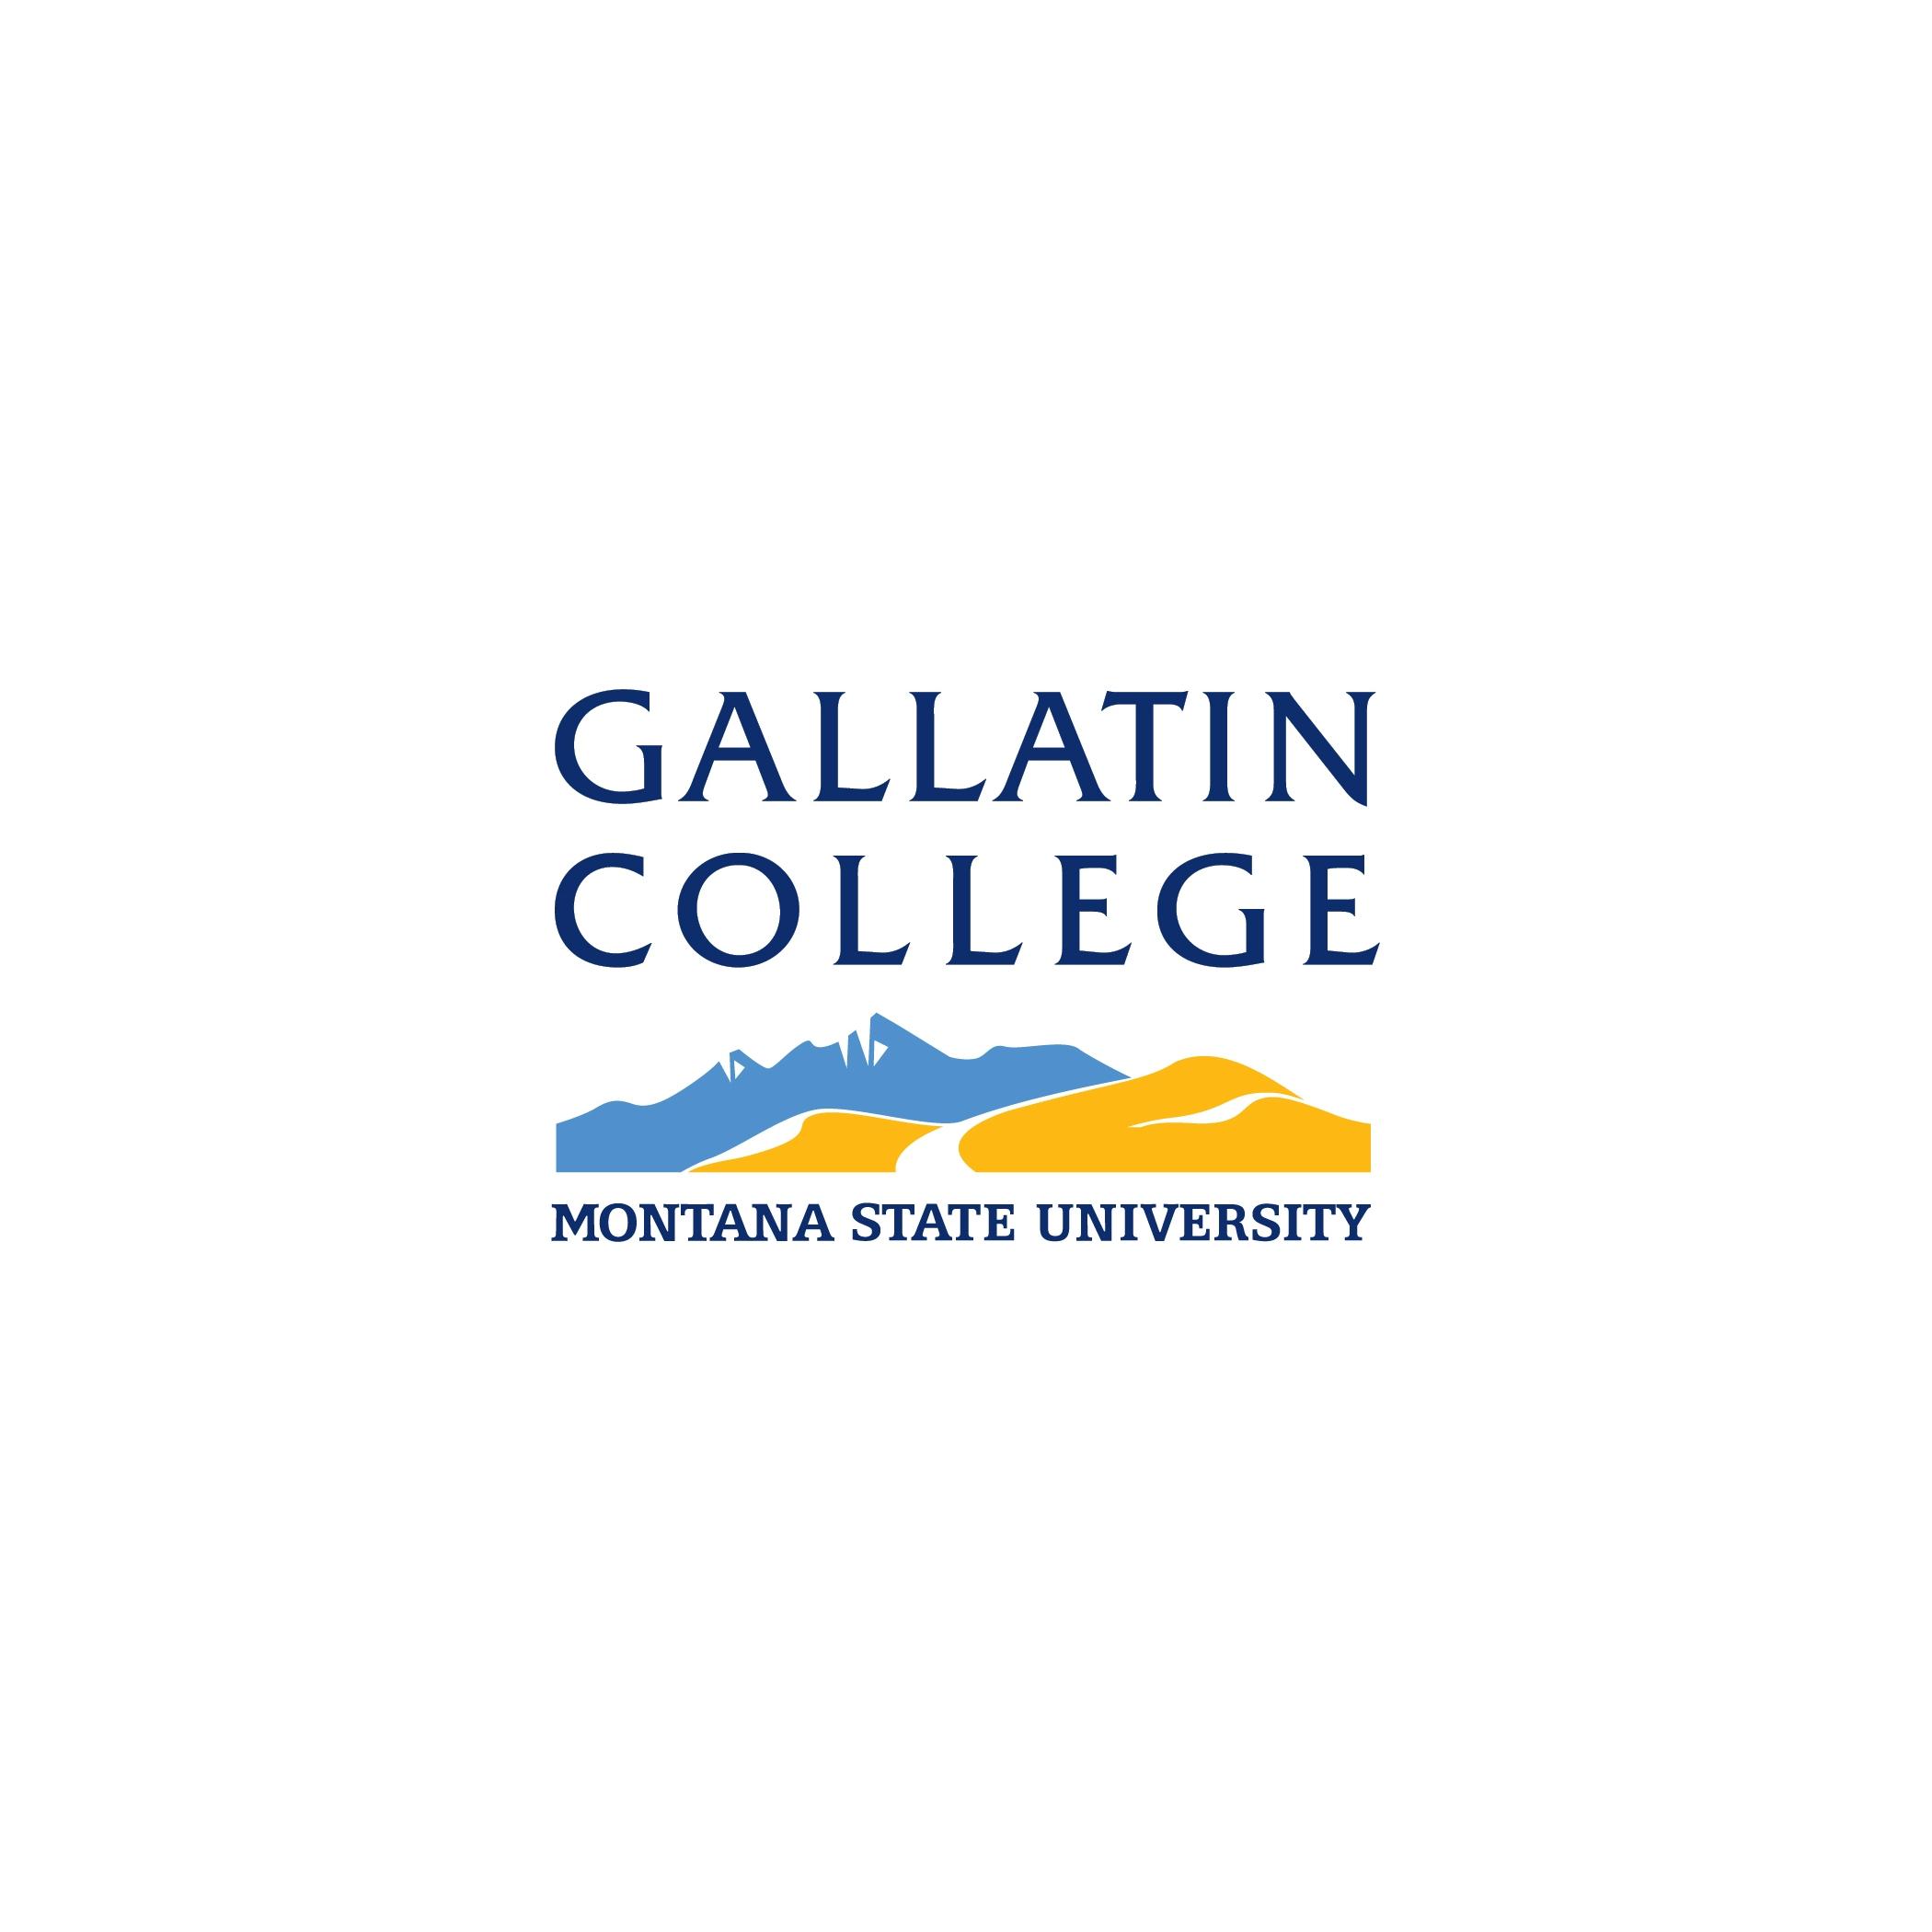 Gallatin College Virtual Celebration | Msu Event with Montana State University 2020 Fall Calendar